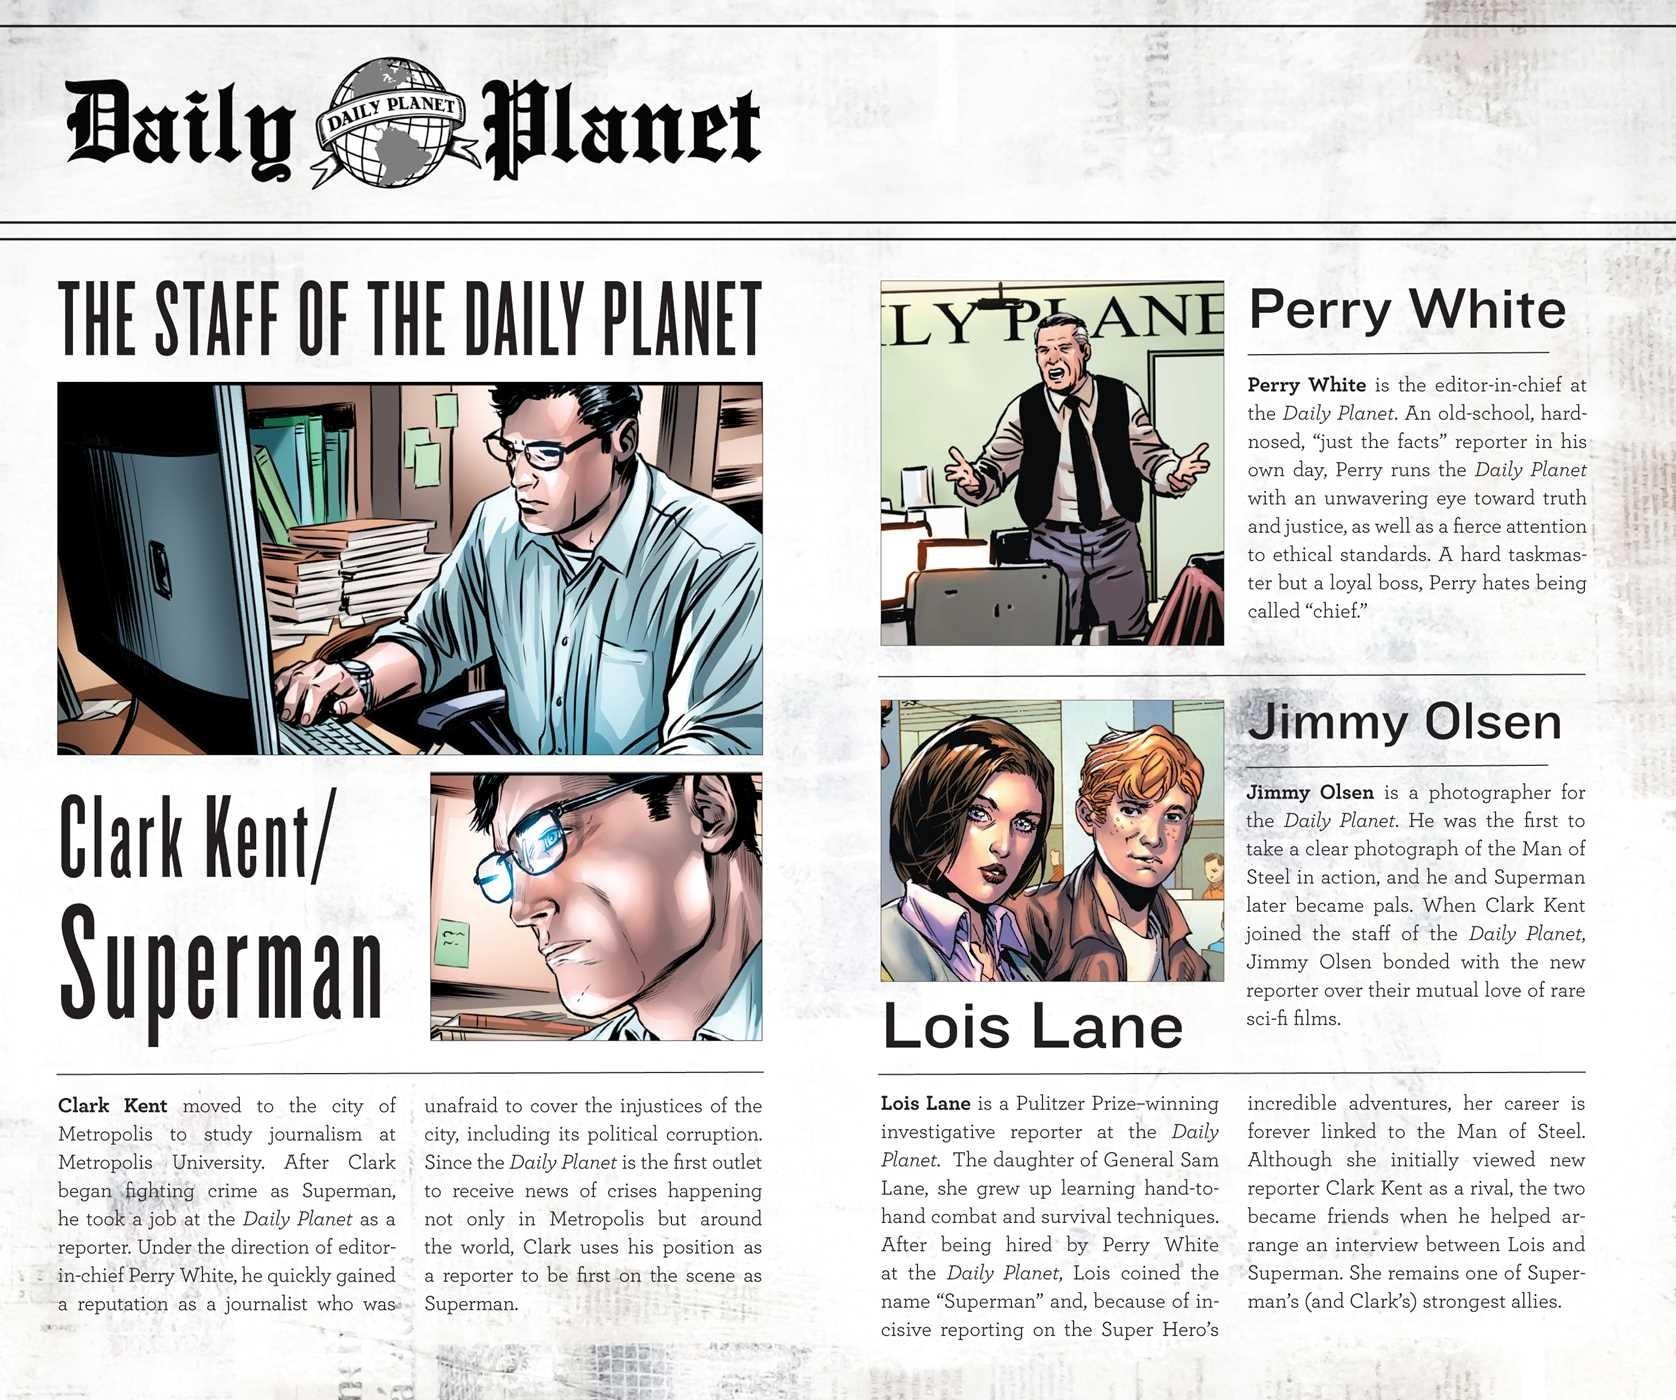 daily planet newspaper template free - opucuk.kiessling.co